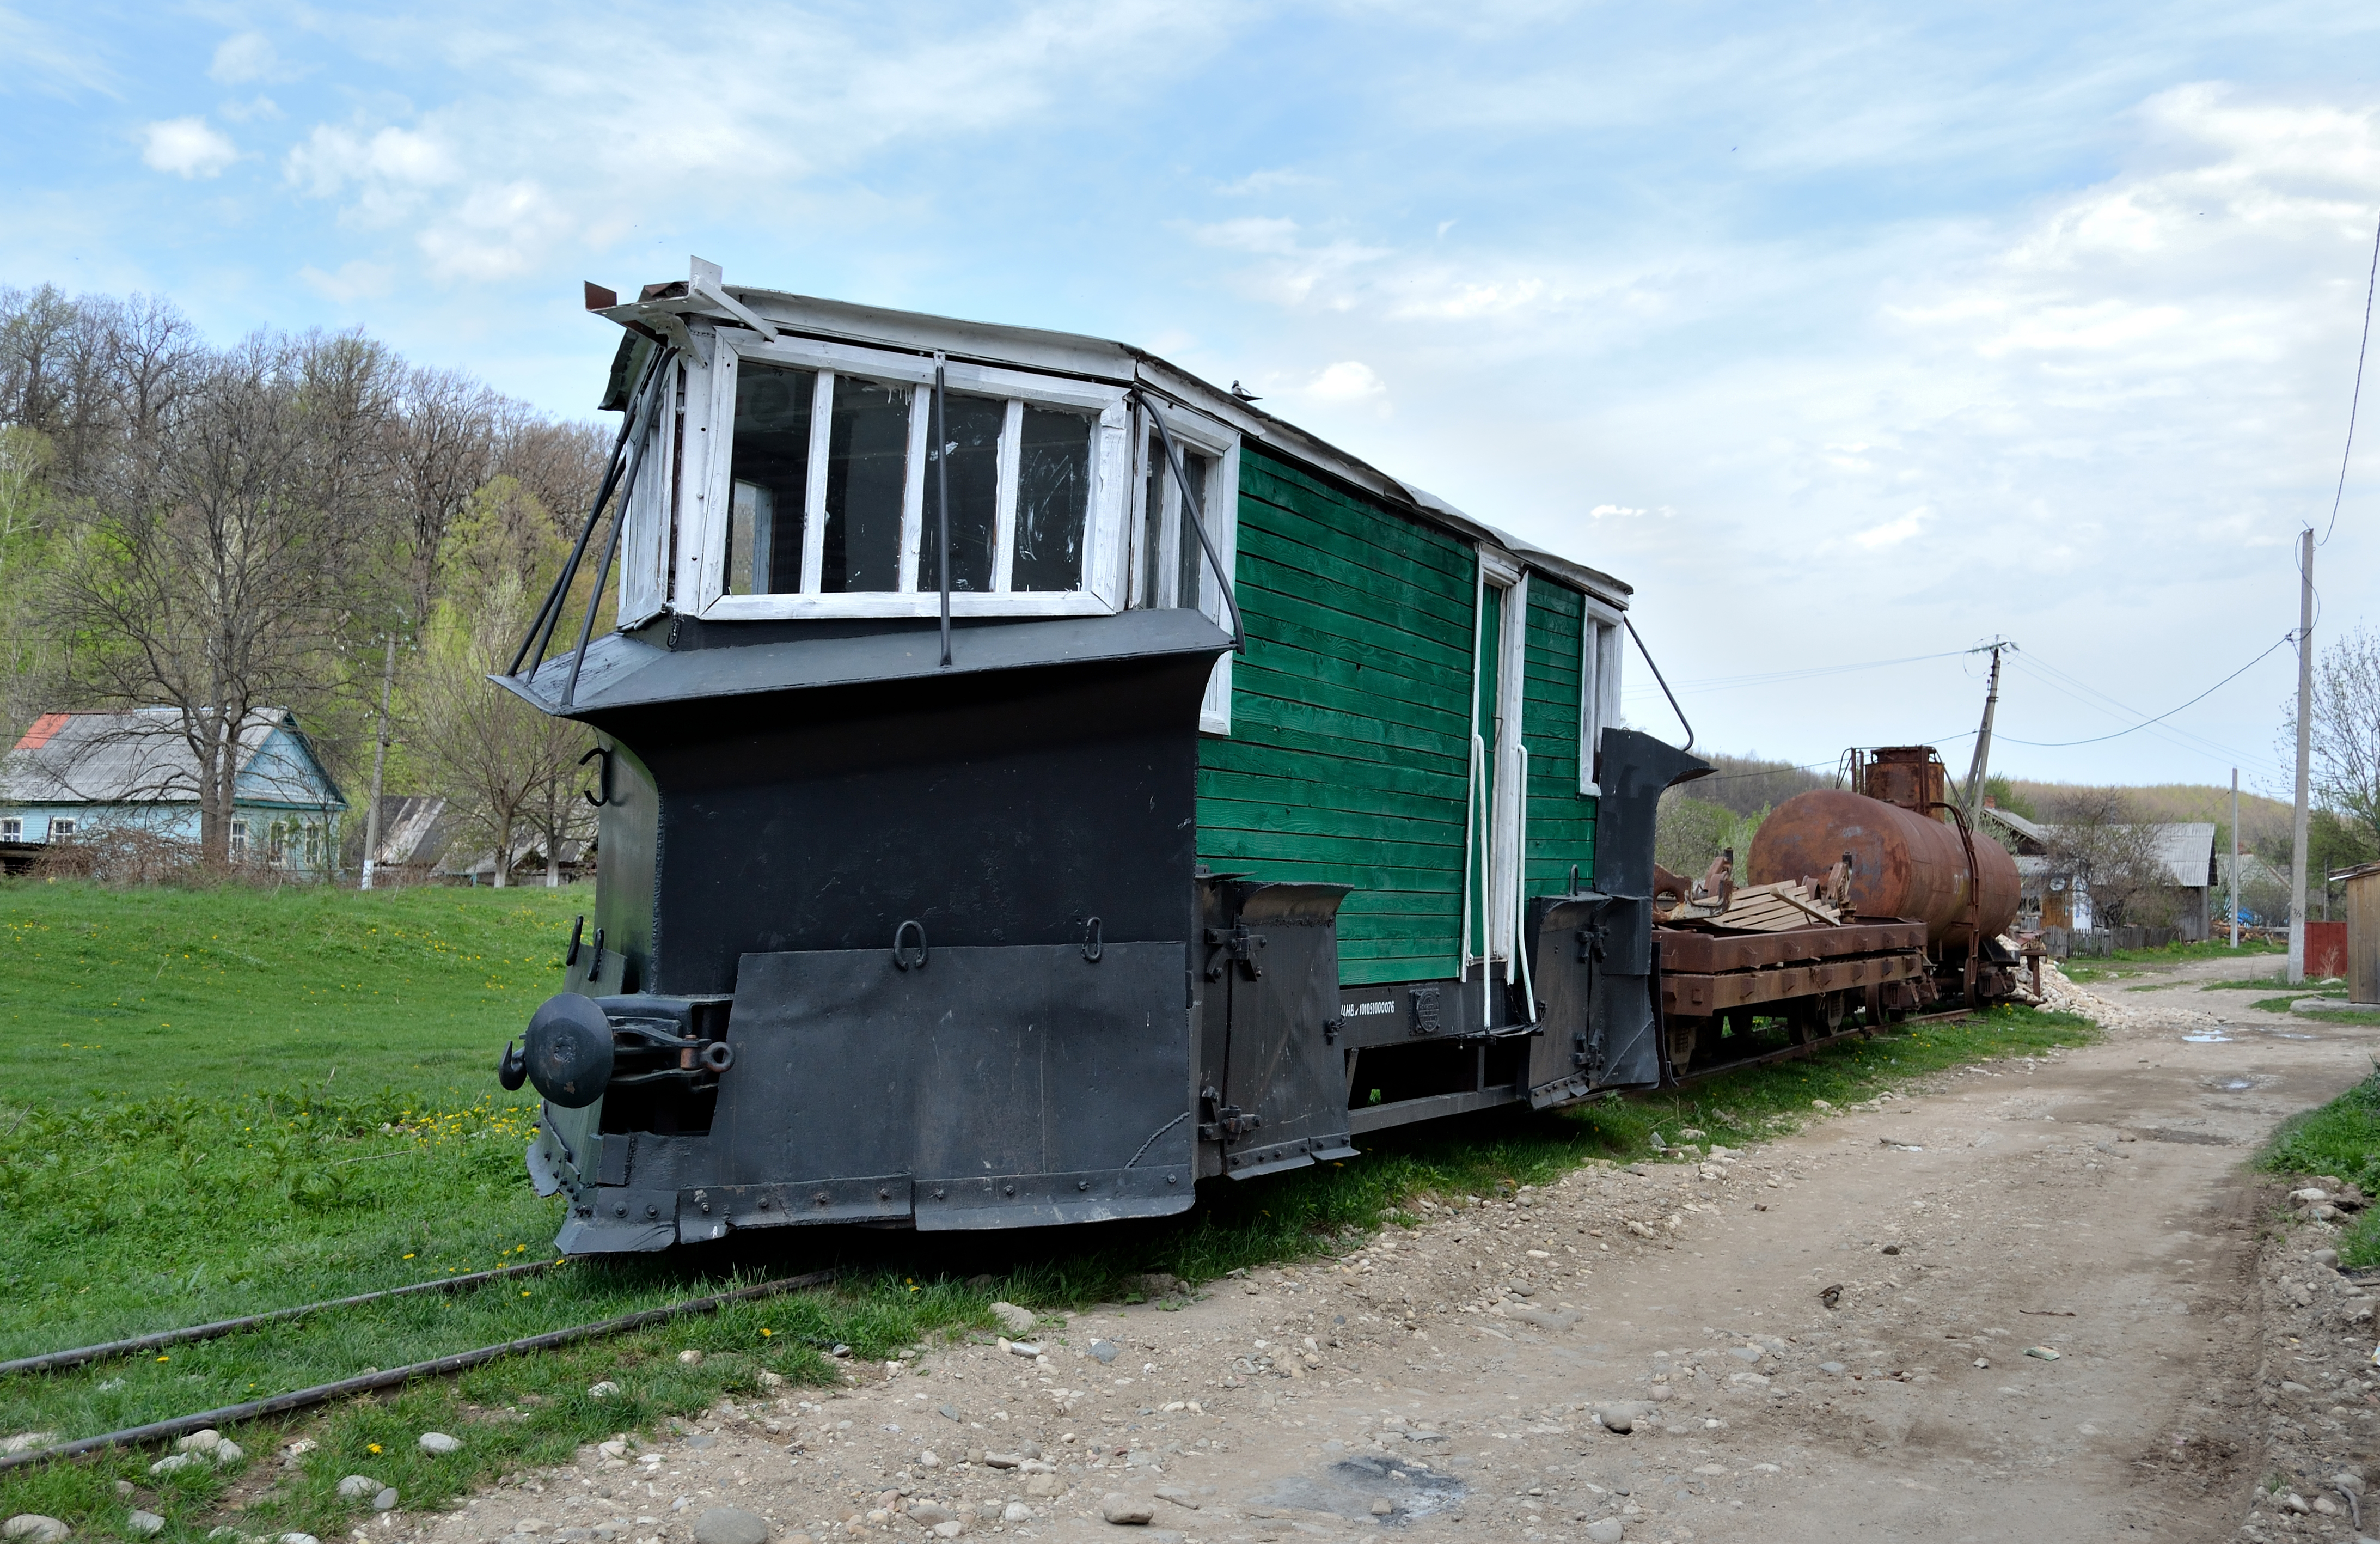 Tram Big Cat Antenna Reviews